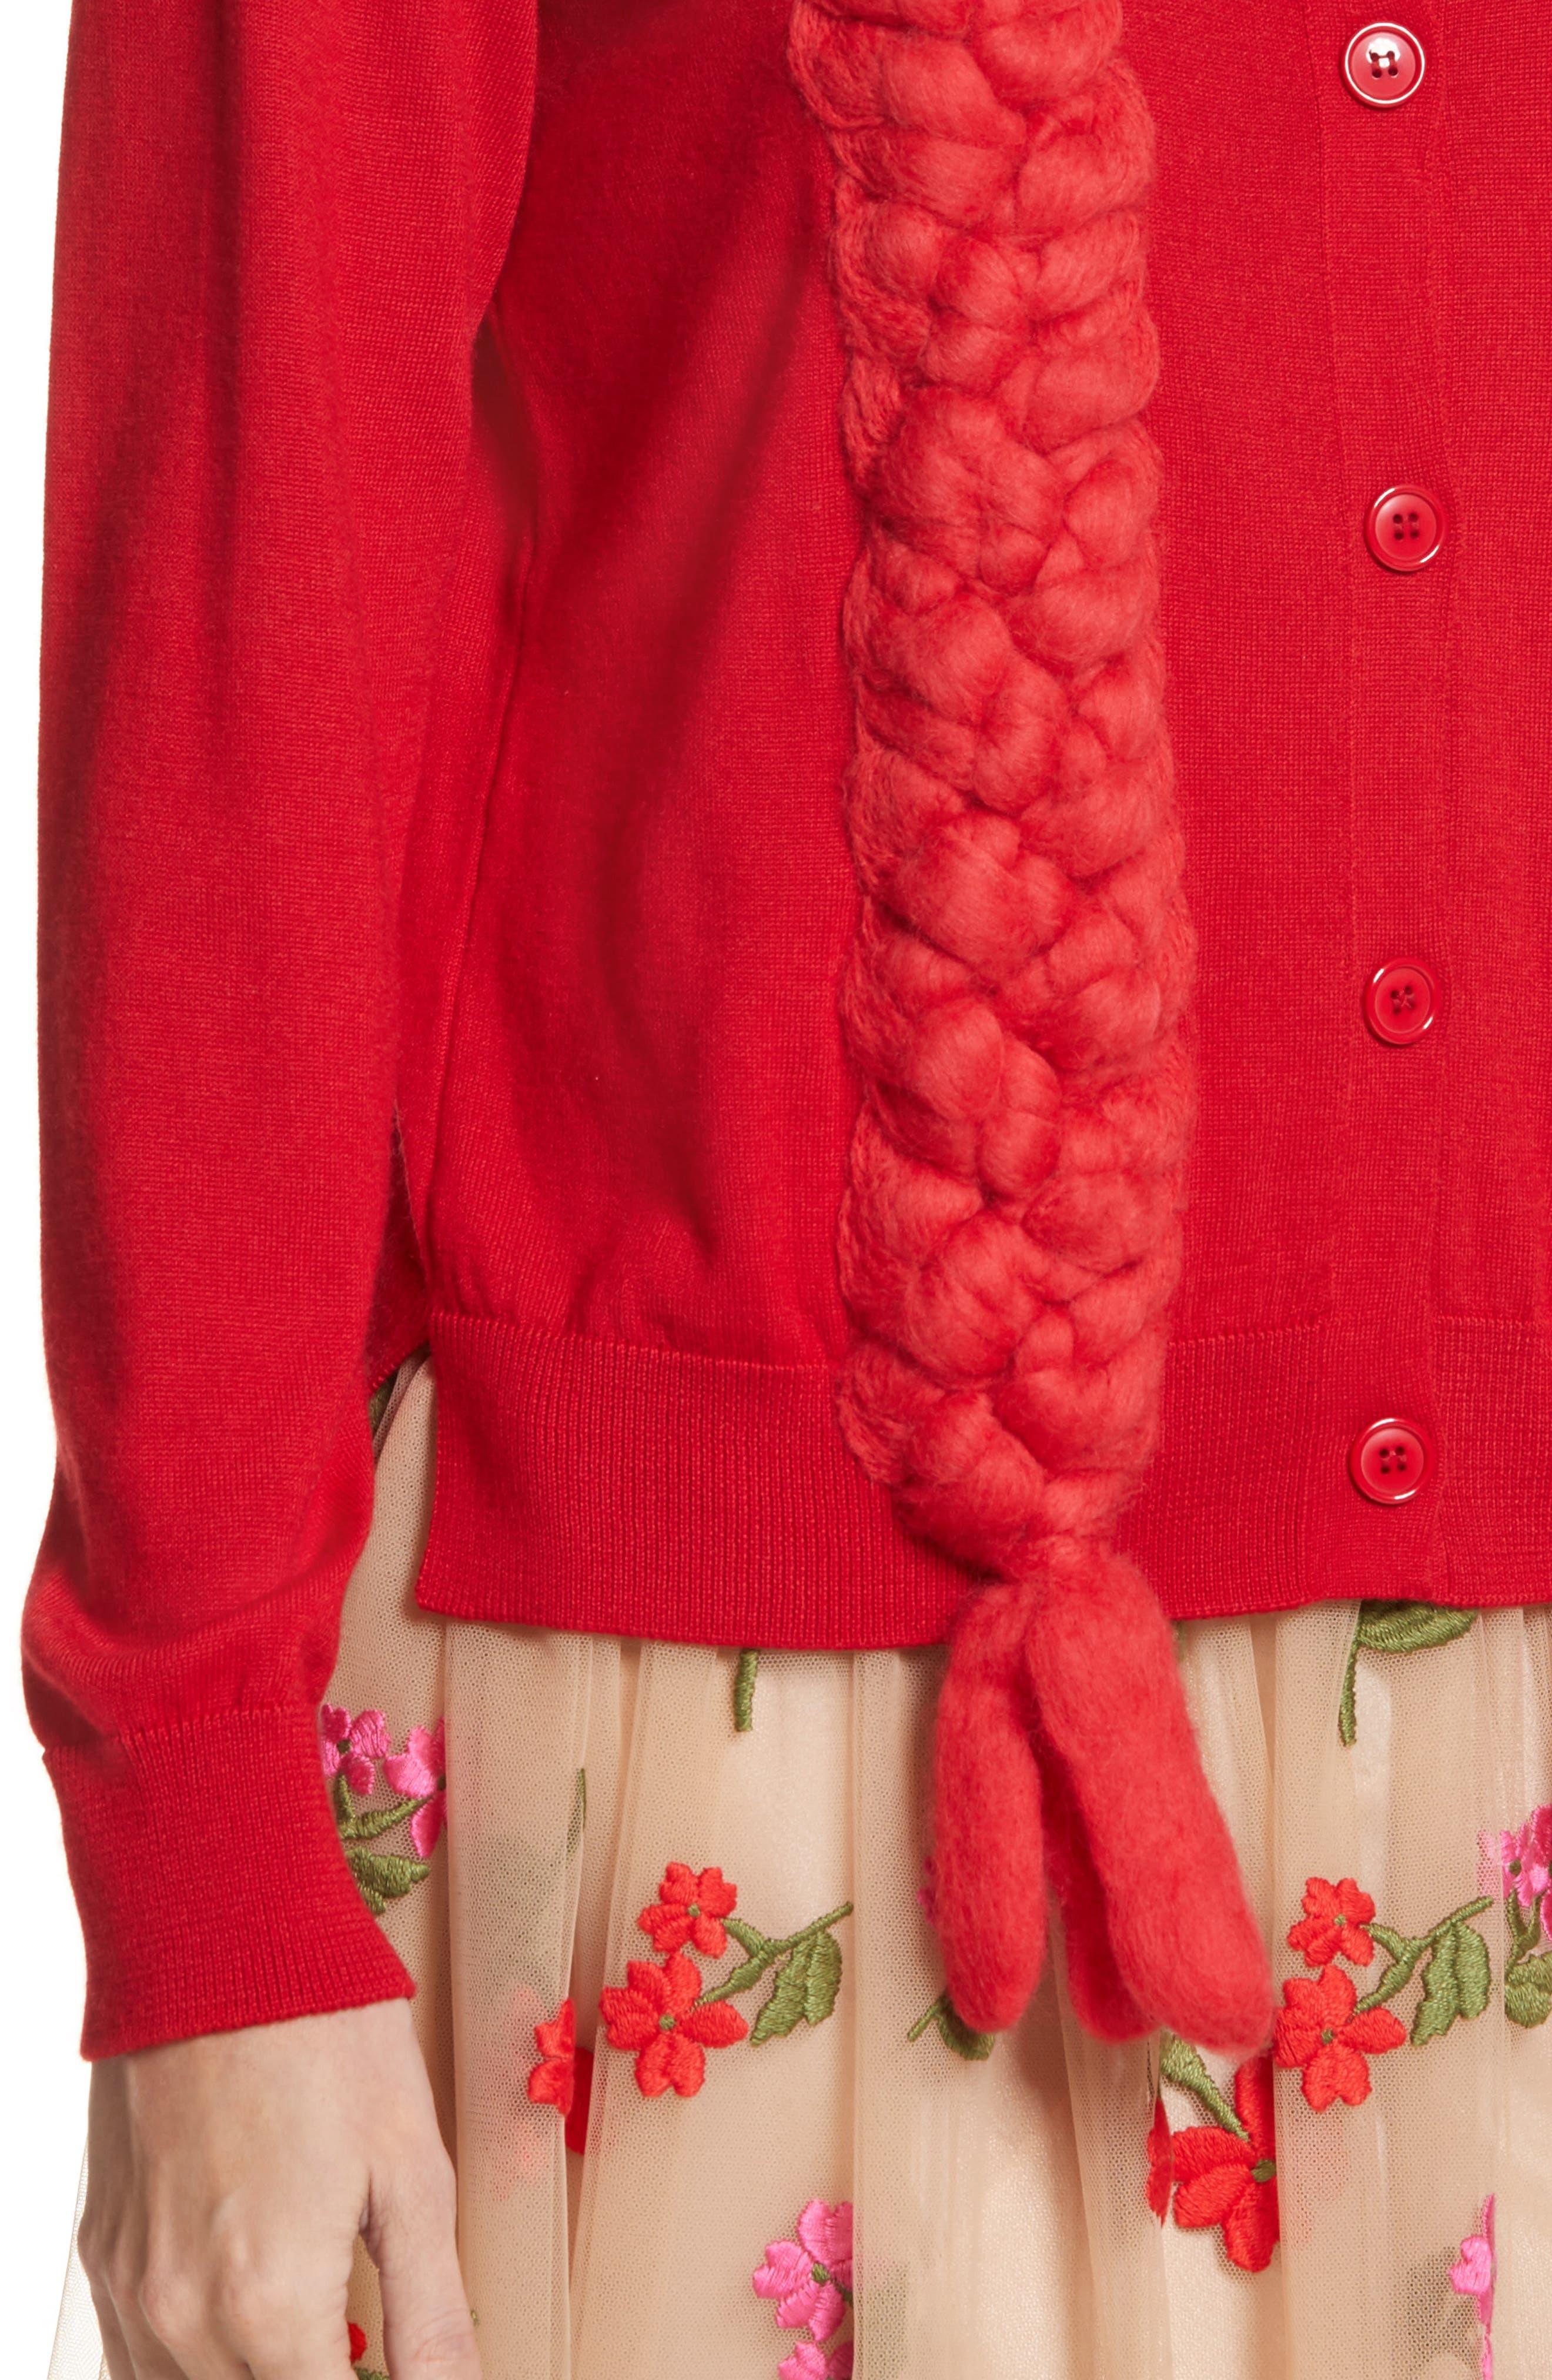 Felted Plait Merino, Silk & Cashmere Button Cardigan,                             Alternate thumbnail 4, color,                             600